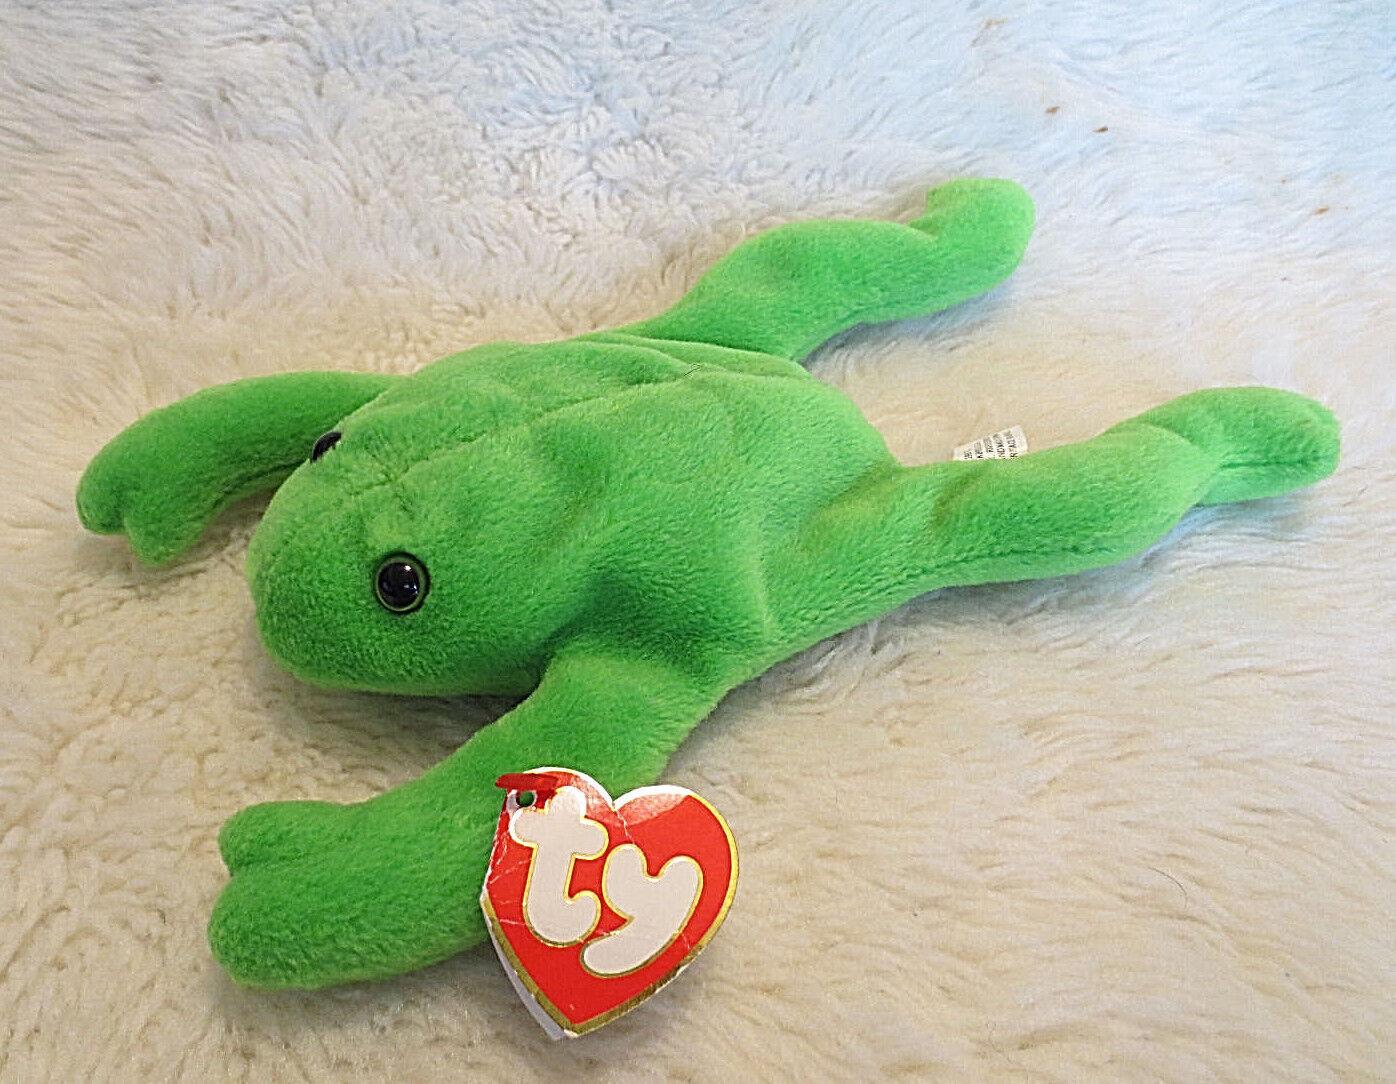 TY Beanie Baby Original LEGS the Frog 1993 - PVC - RARE